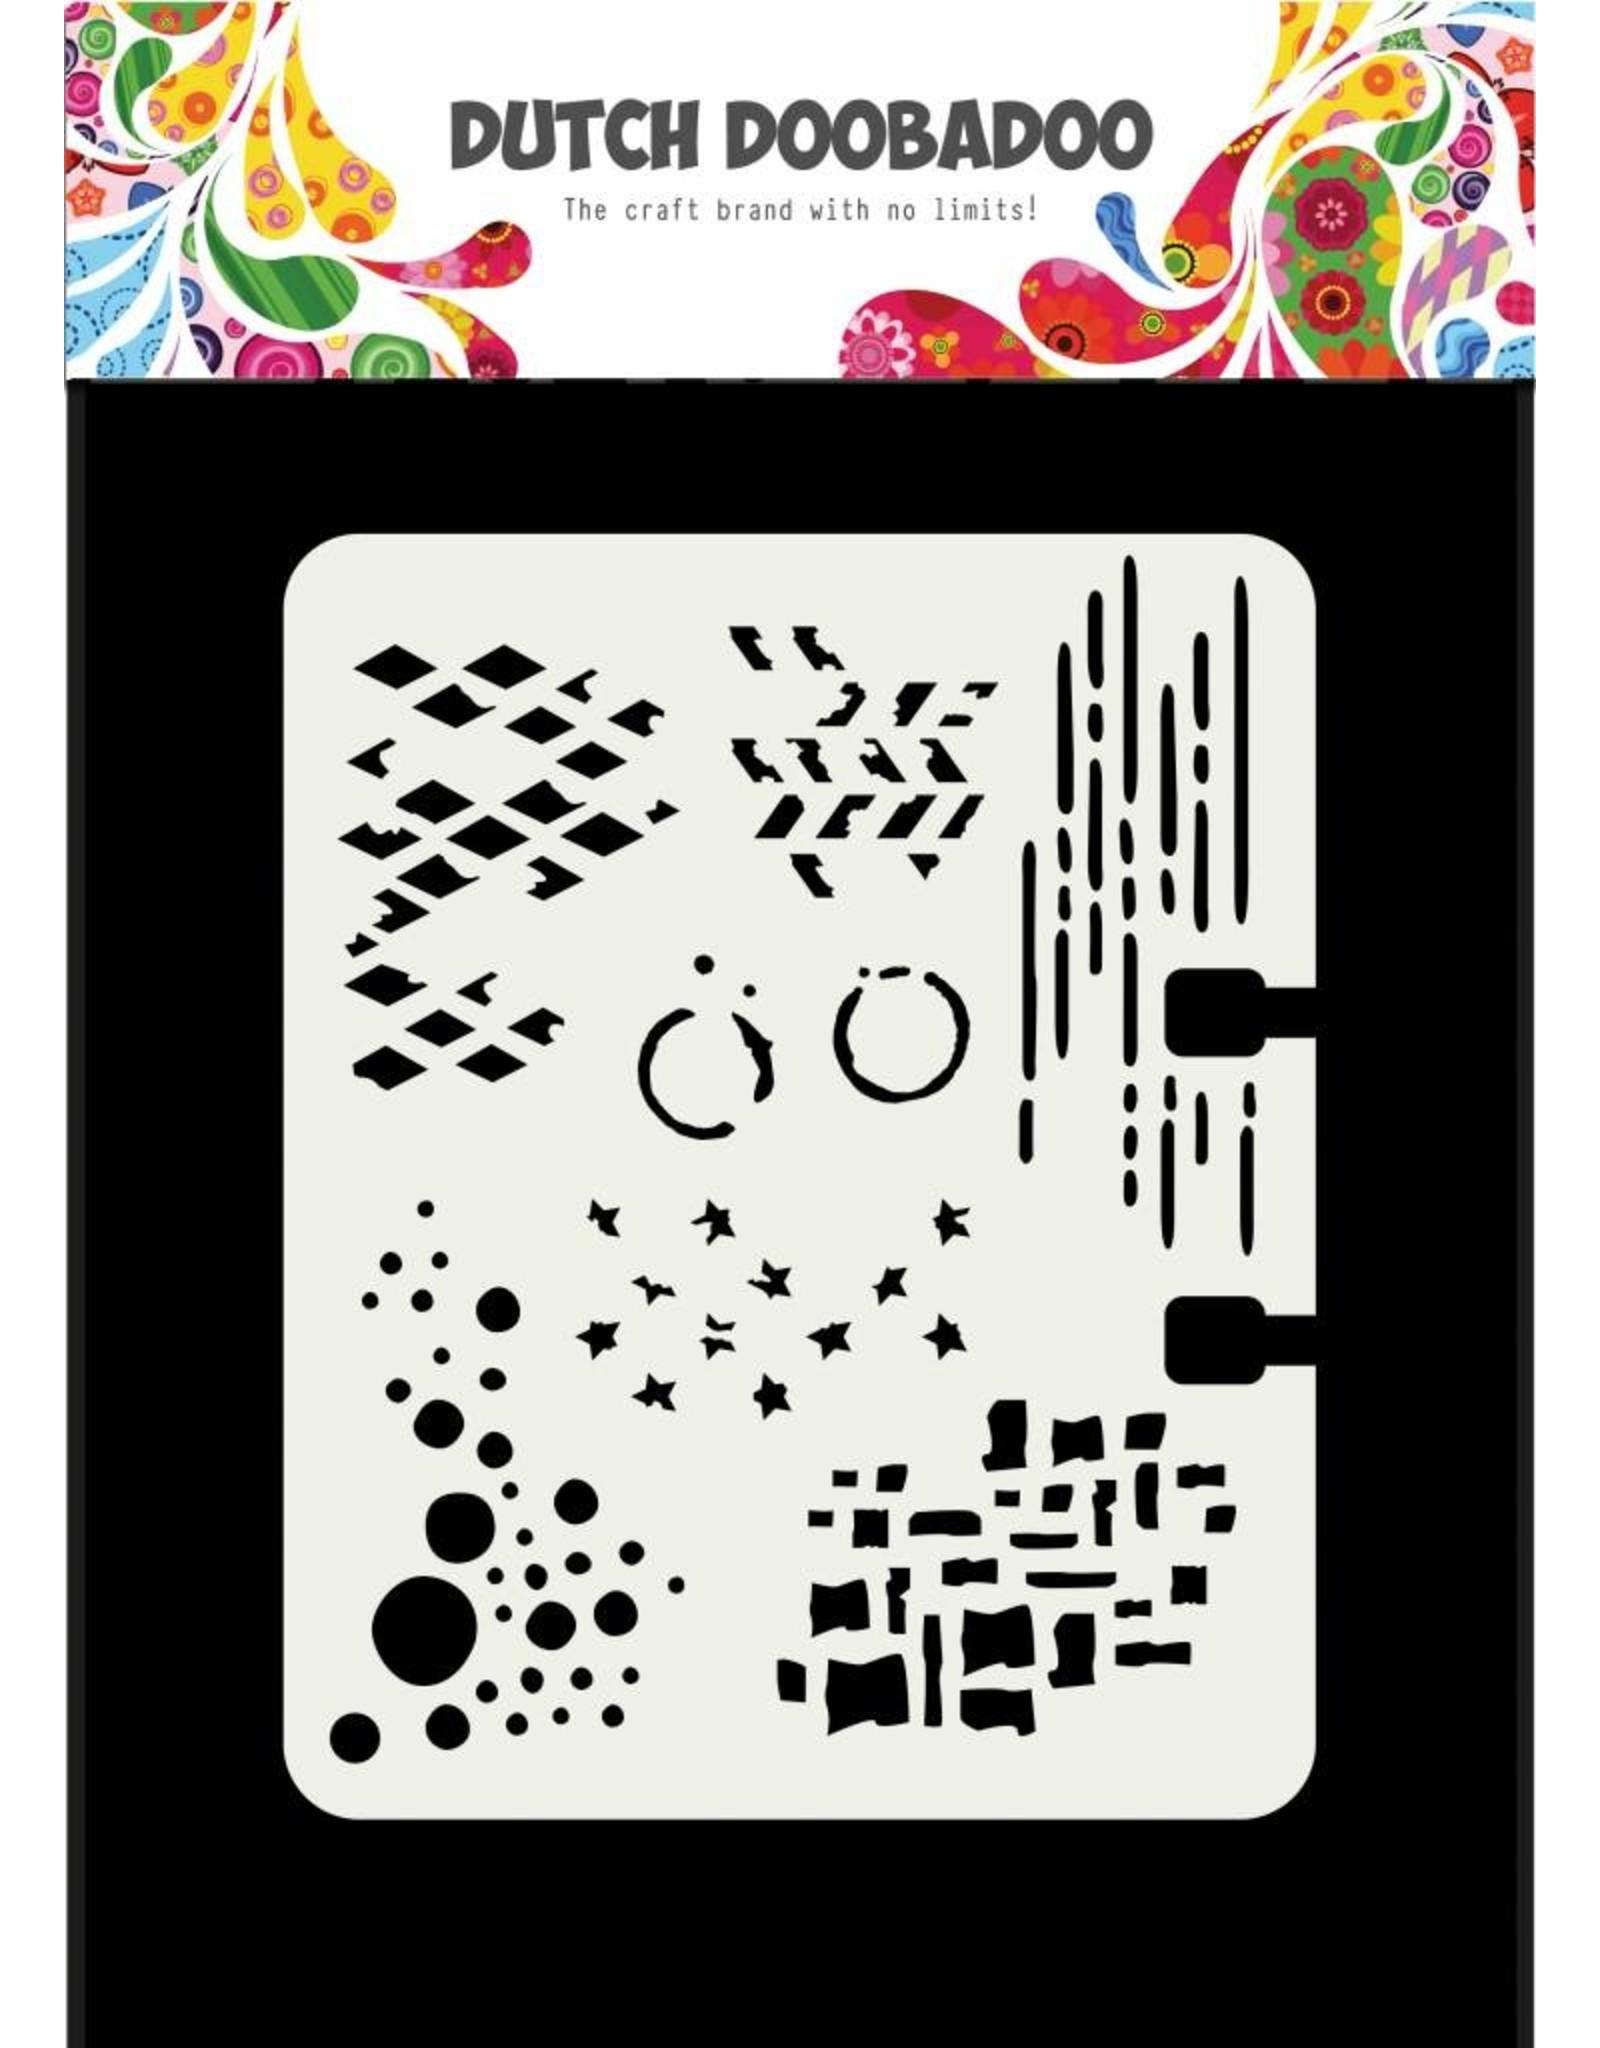 Dutch Doobadoo Dutch Mask Art Rollerdex Pattern 102 x 82 mm